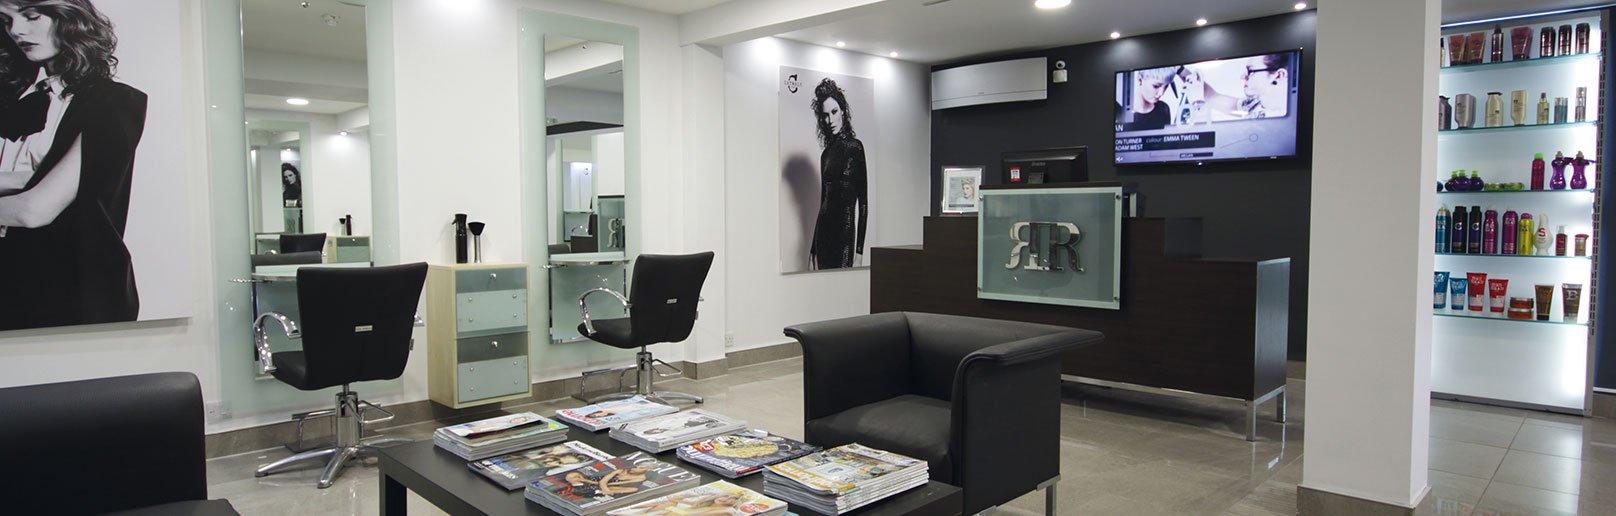 Forresters Thatcham hair salon Reception